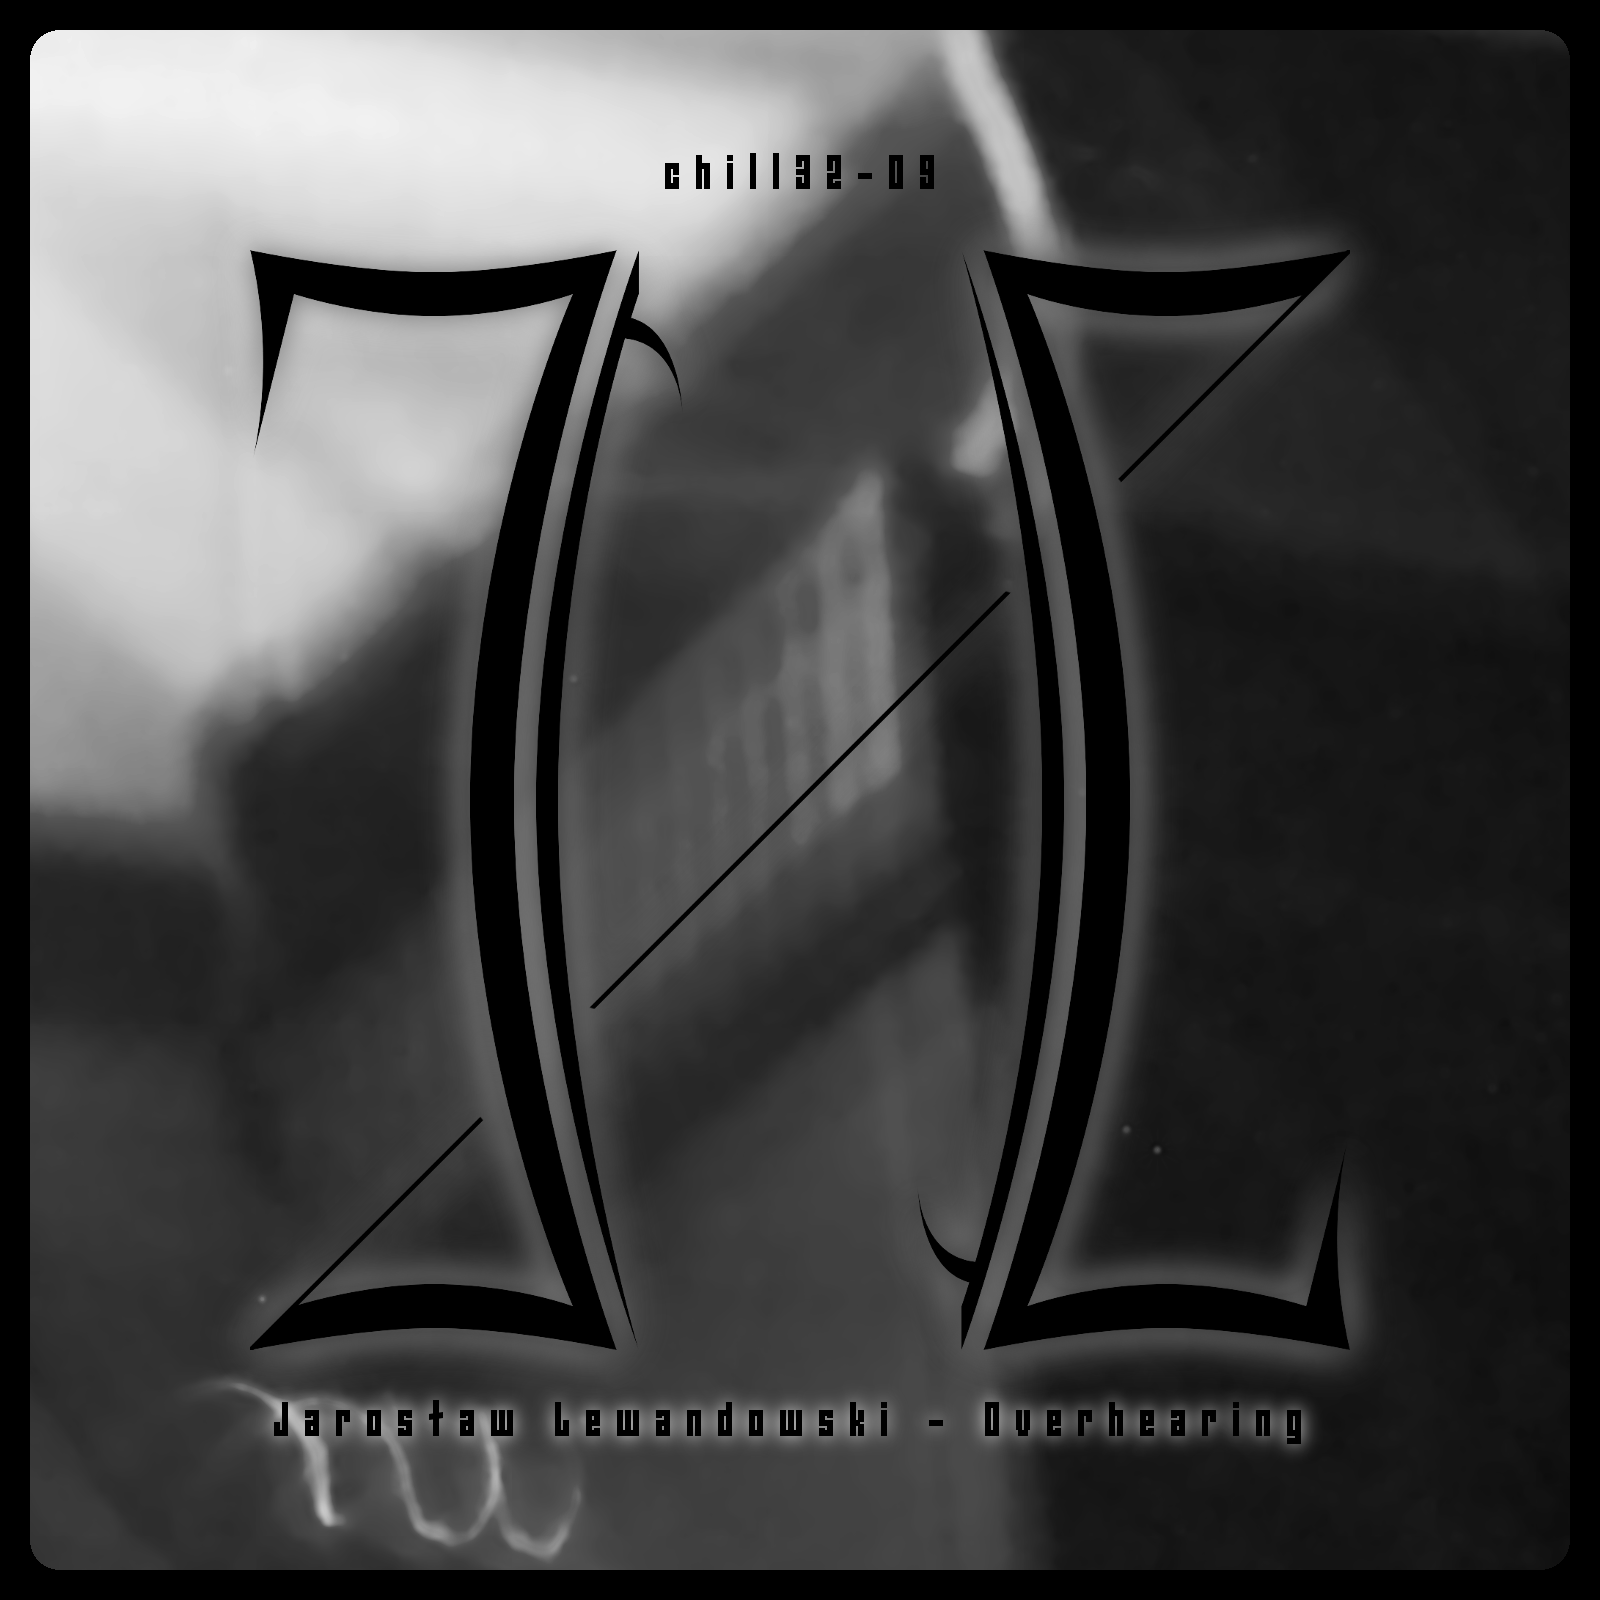 chill32-09 - Jaroslaw Lewandowski - Overhearing